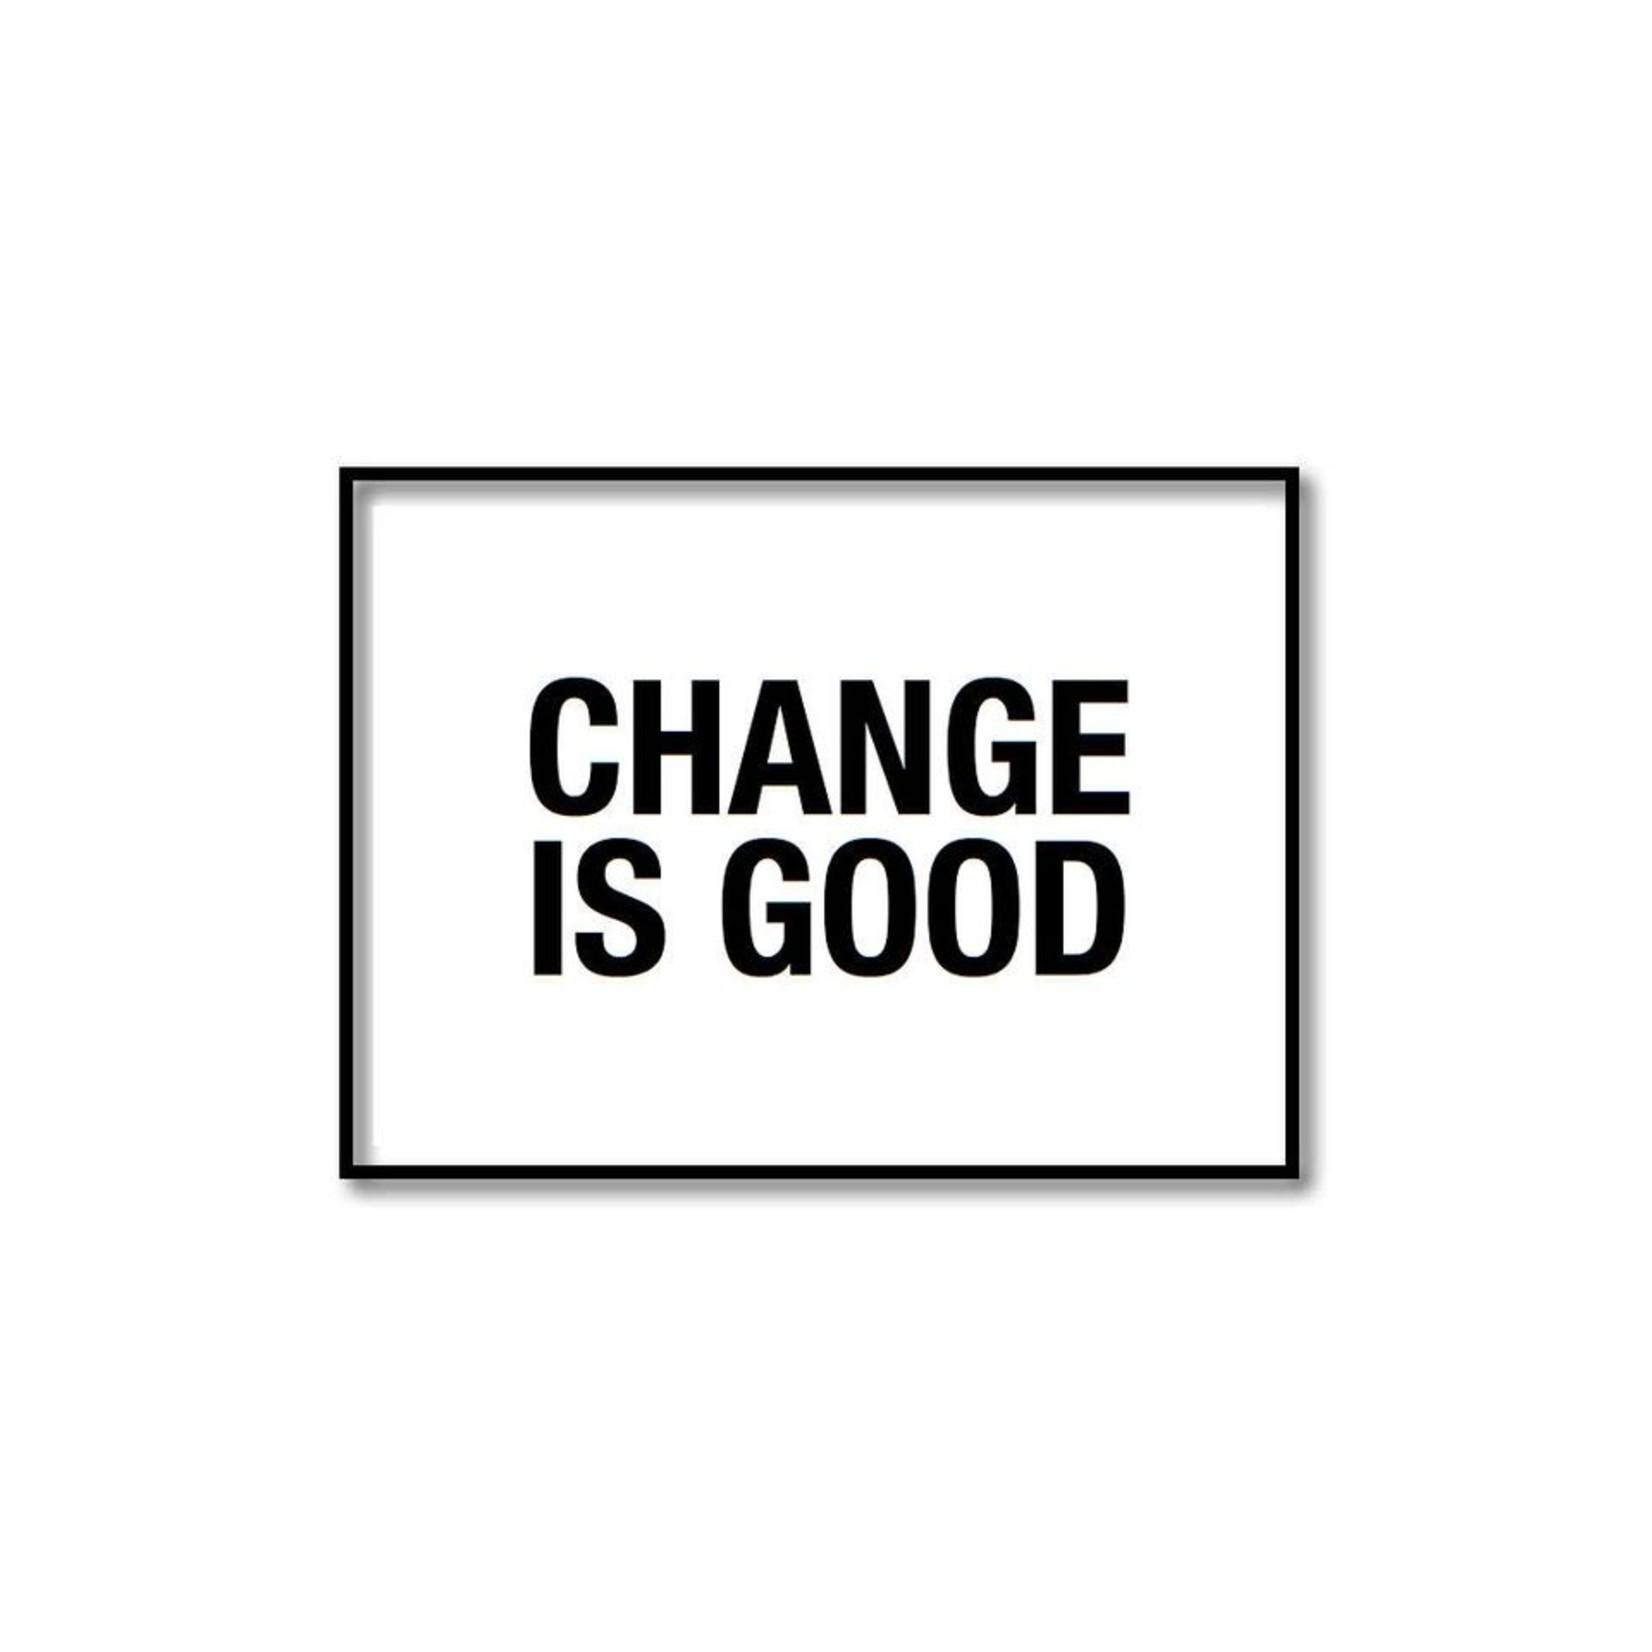 Pixelposter - Change is good (A5)